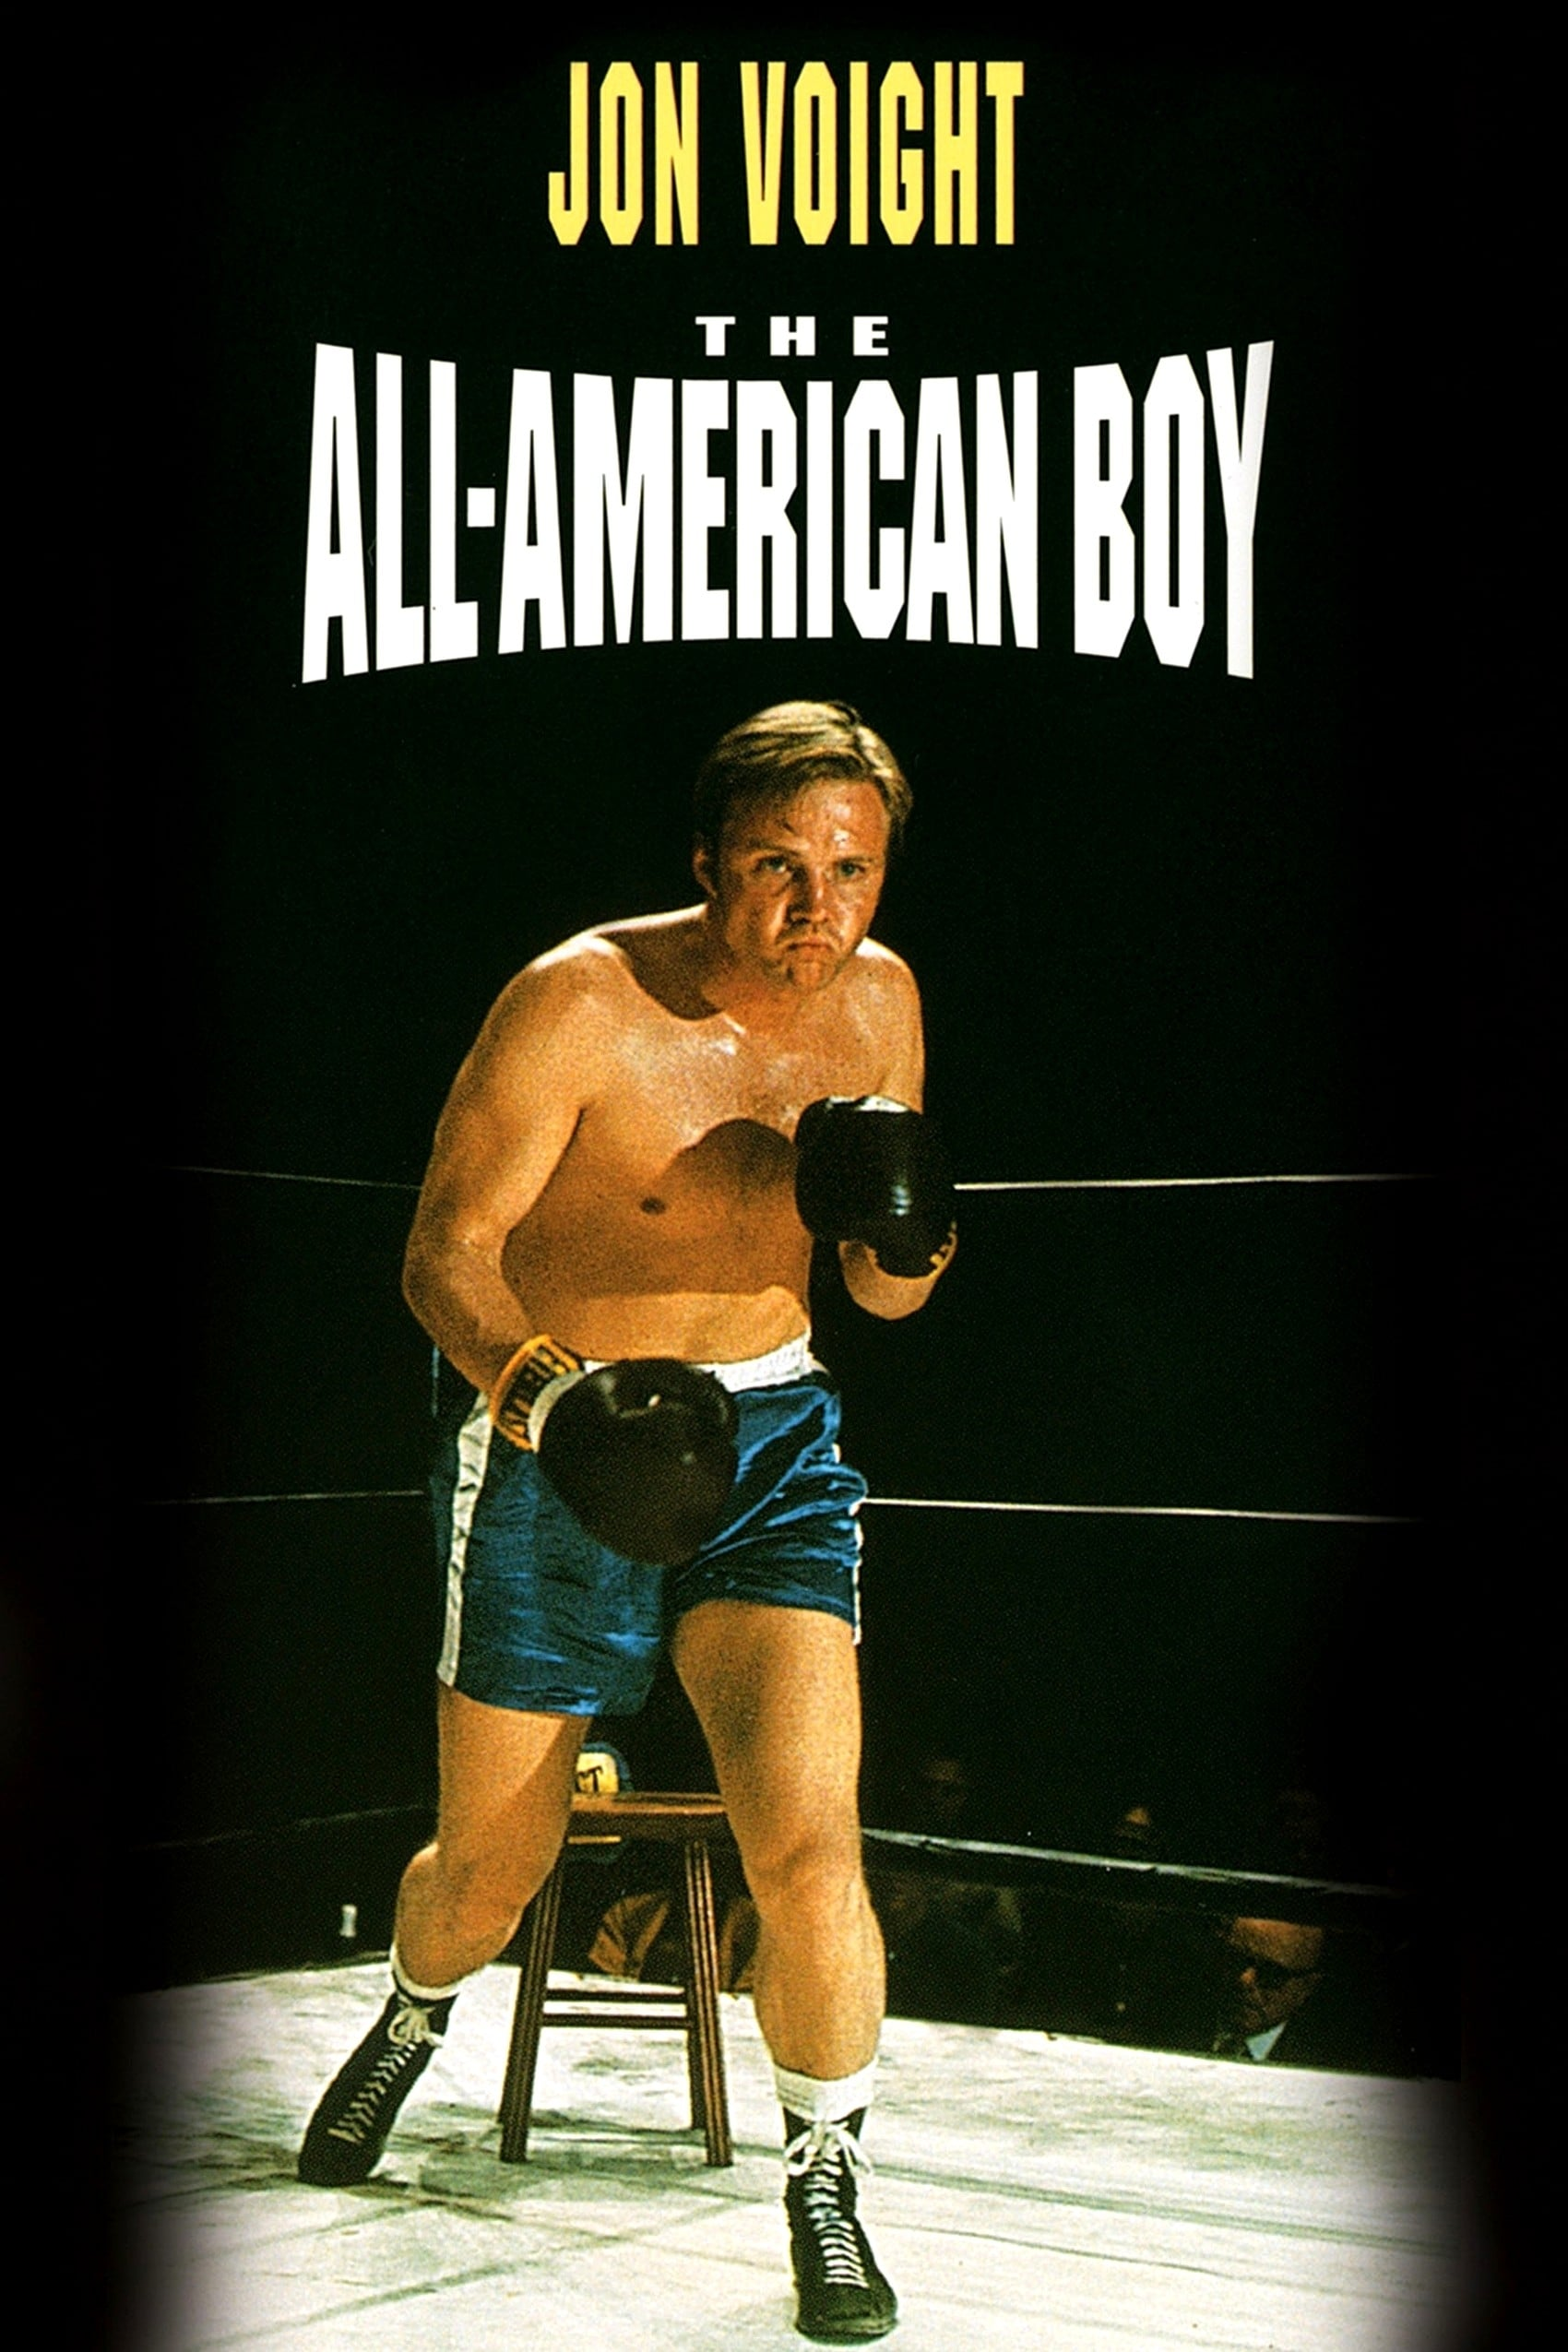 The All-American Boy (1973)